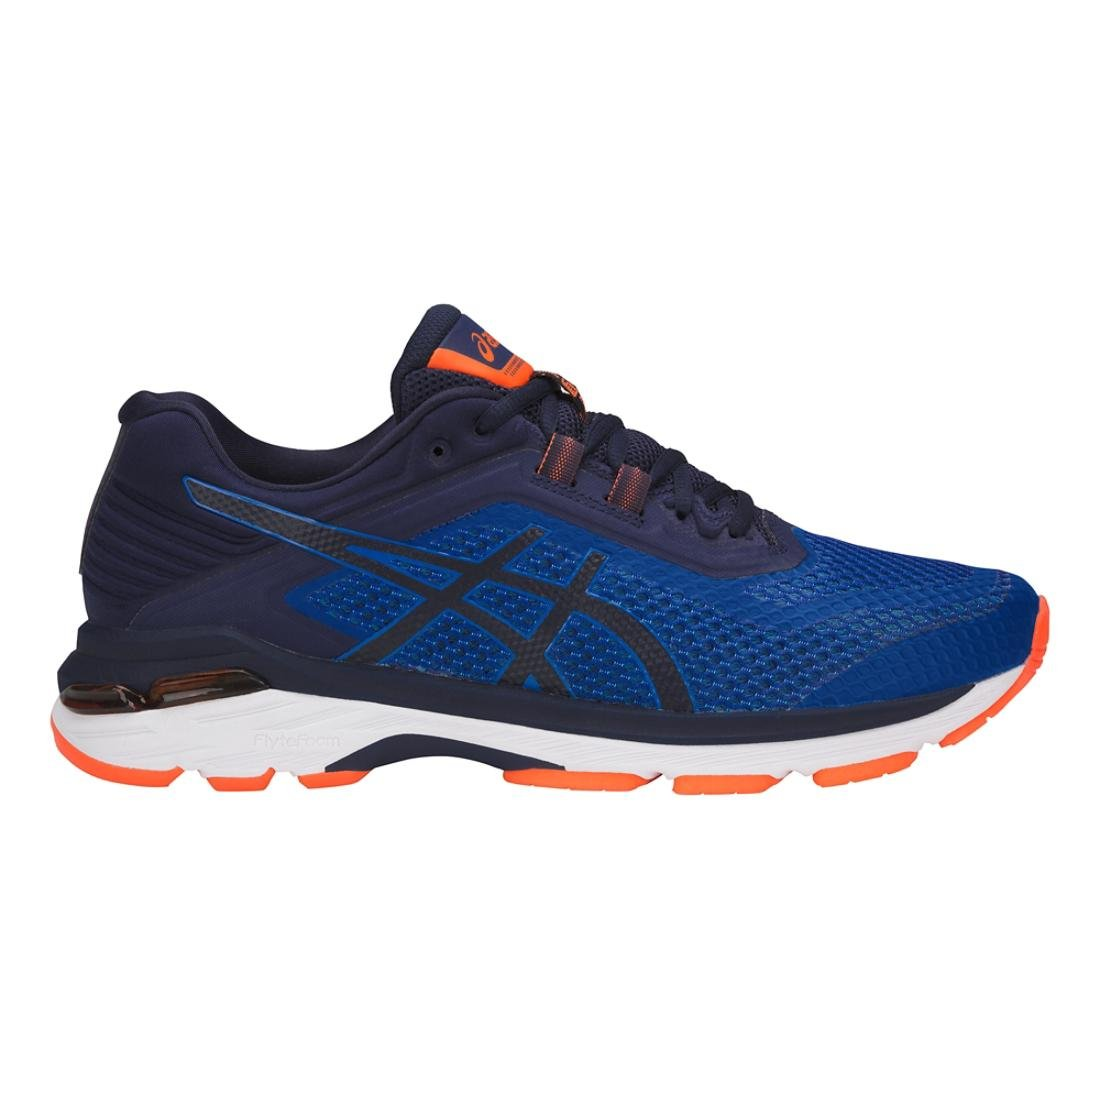 ASICS Mens GT-2000 6 Running Shoe - Color: Imperial/Indigo (Regular Width) - Size: 7.5